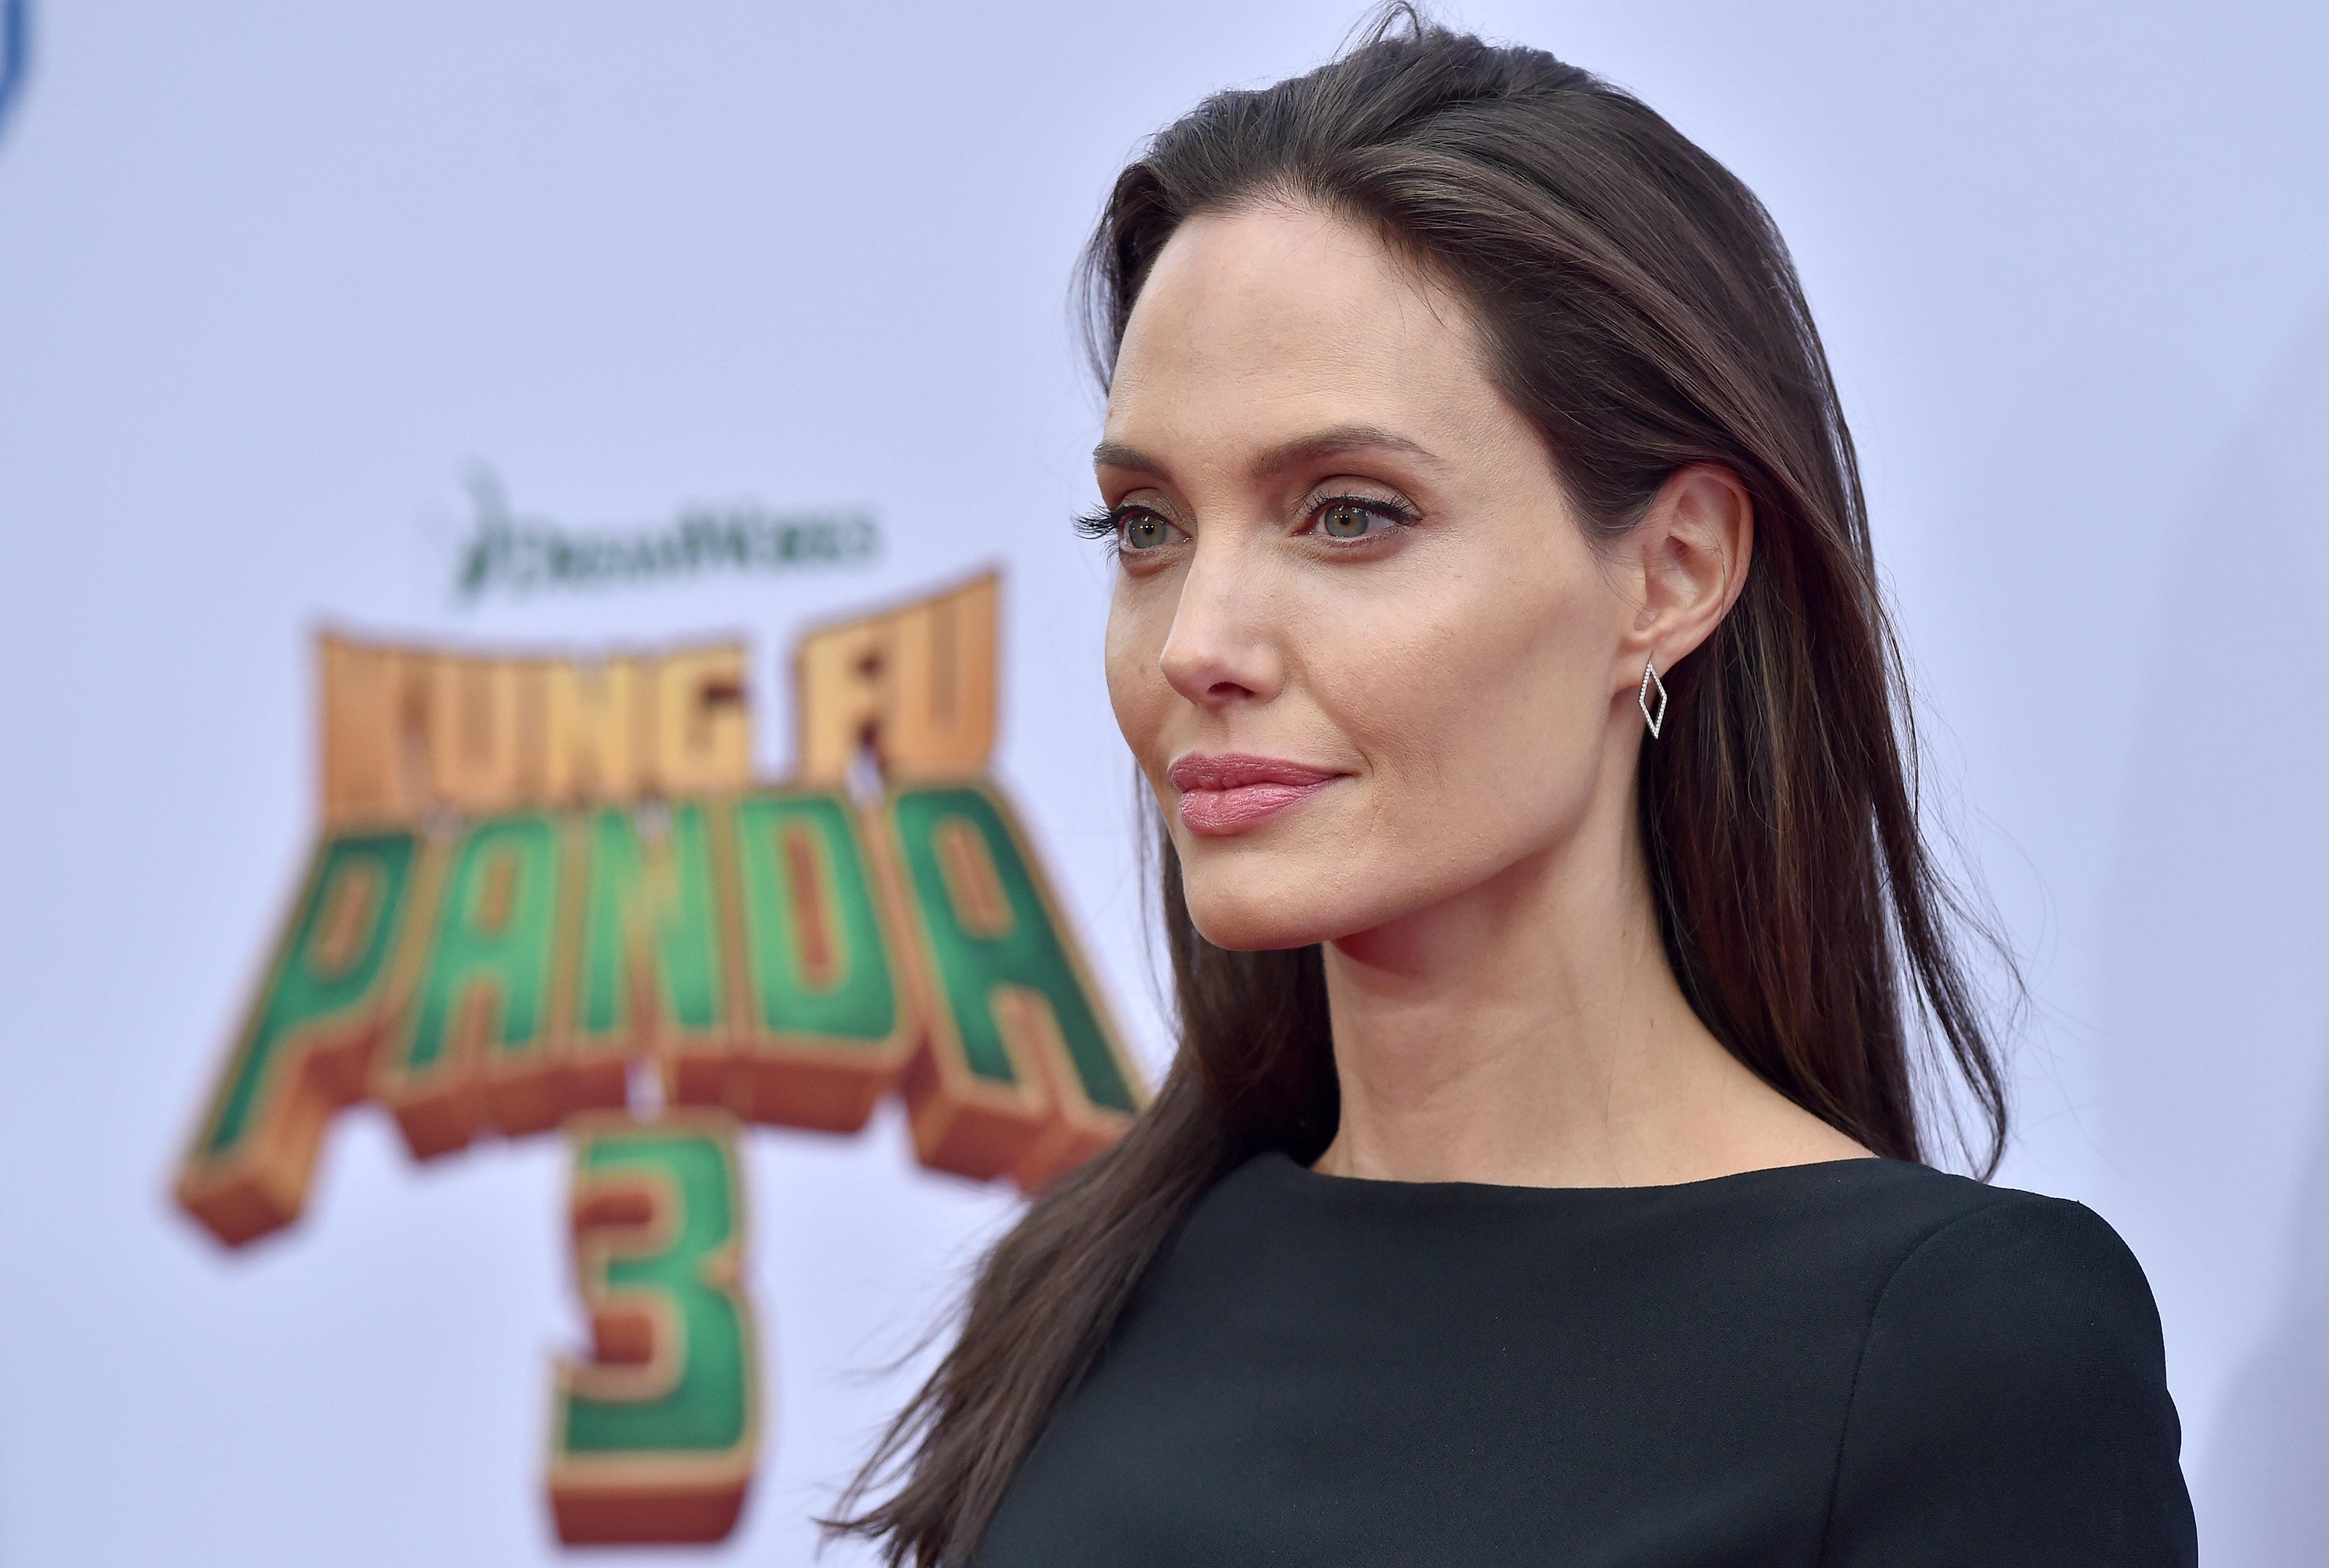 Jolie filed for divorce from Brad Pitt in September citing irreconcilable